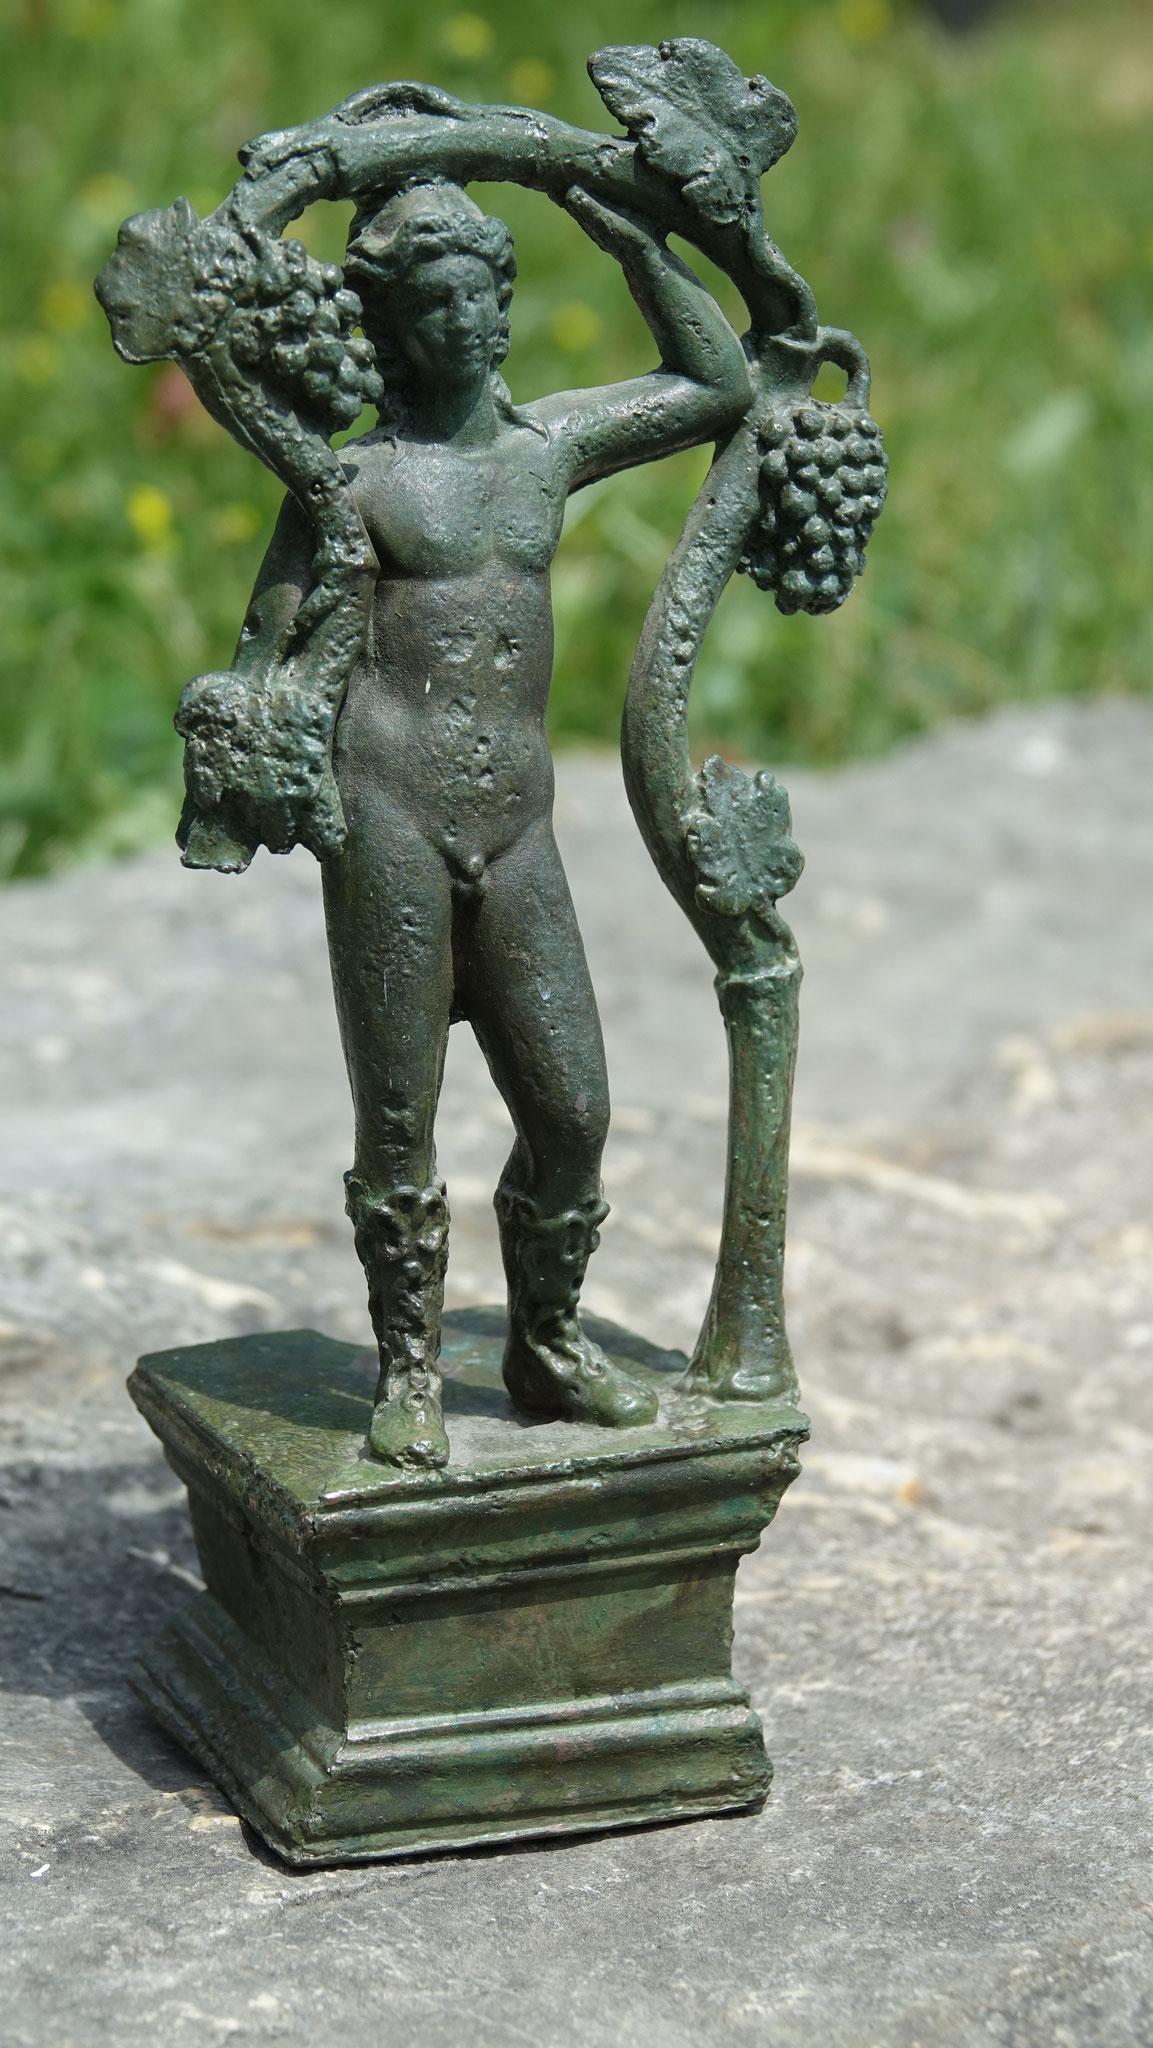 Die original Statuette aus Bronze